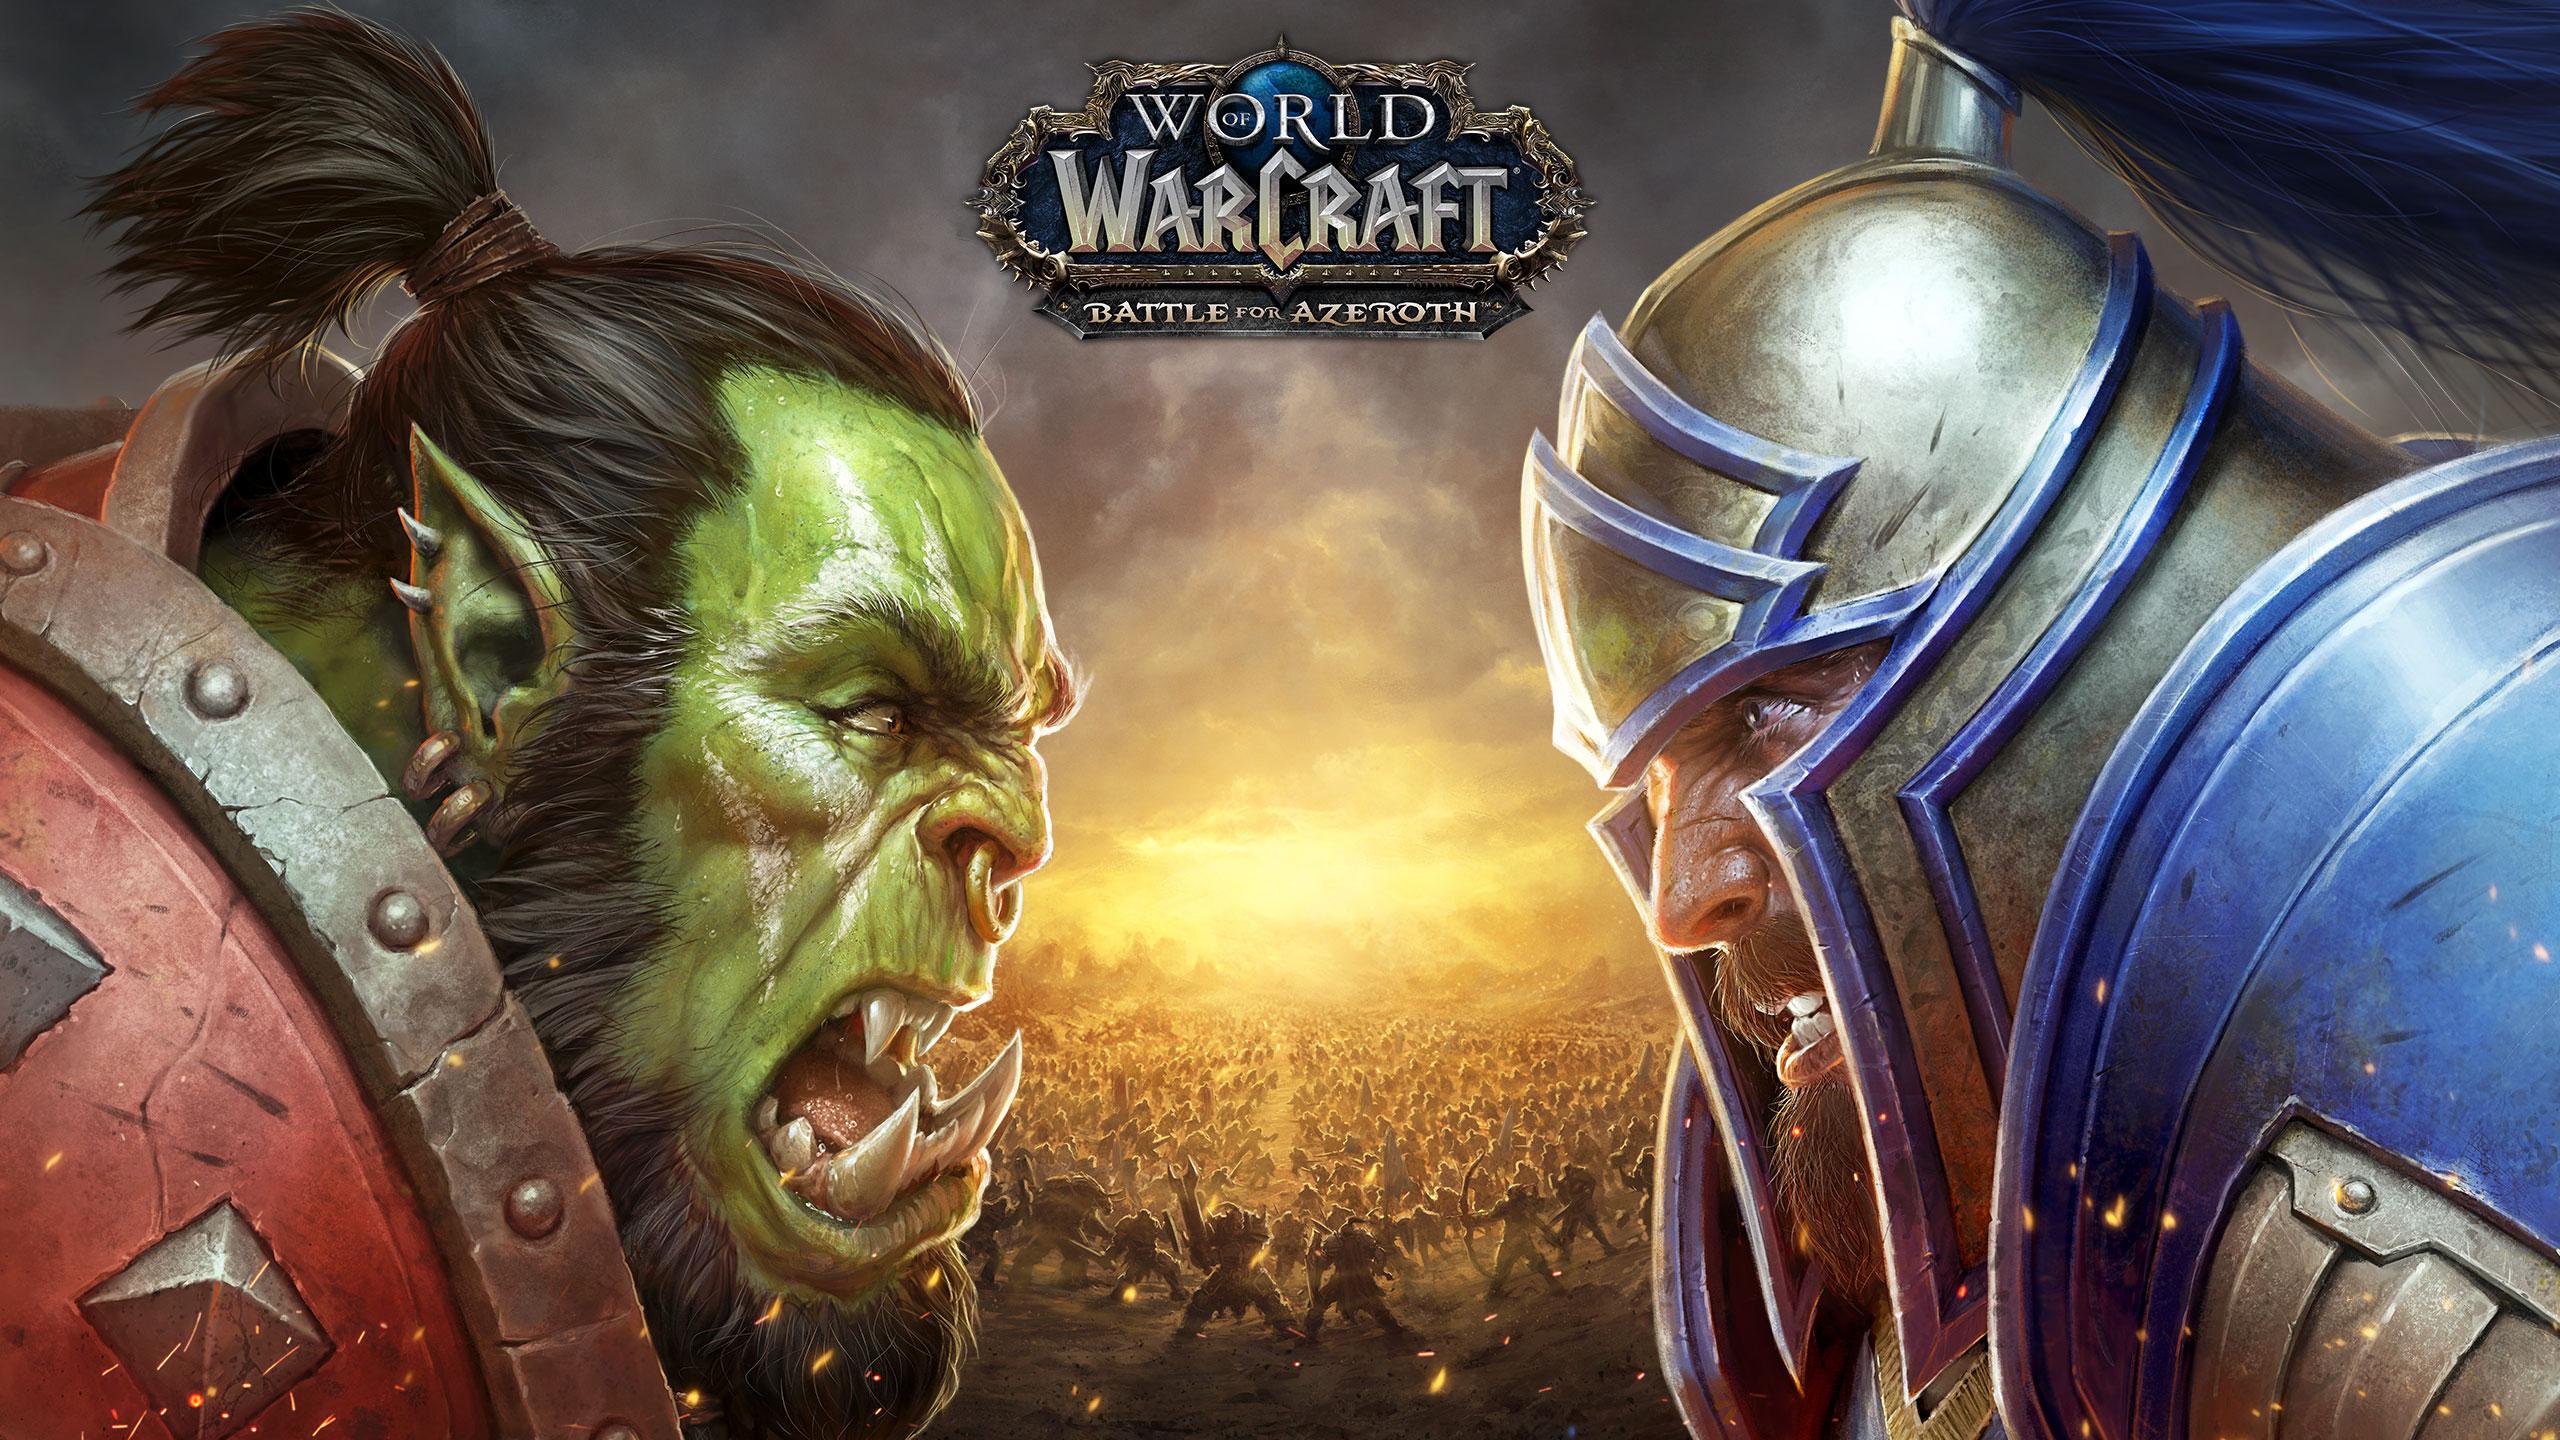 World of warcraft Битва за азерот обои скачать